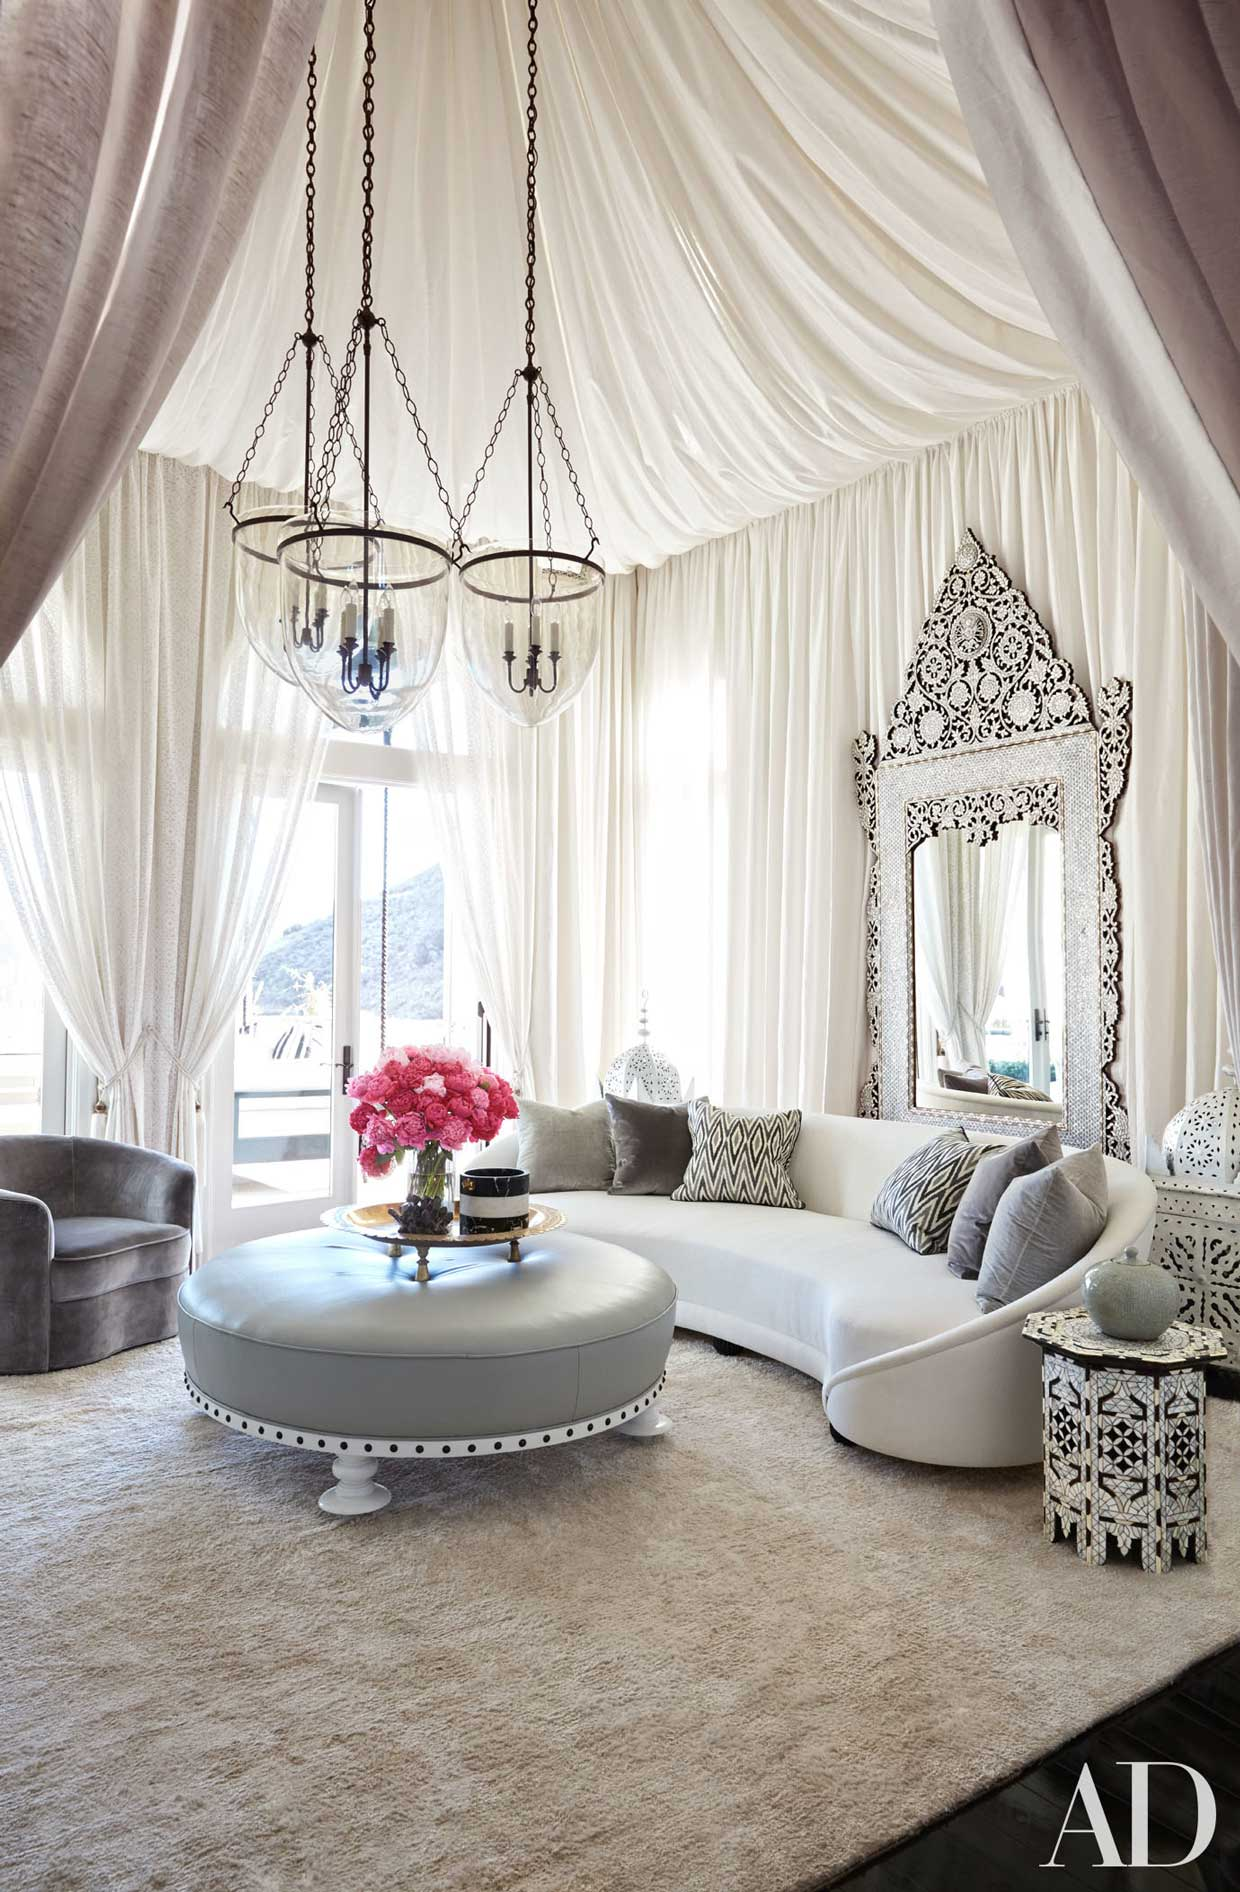 le case da sogno di khloé kardashian e della sorella kourtney | fyhwl - Arredamento Casa Kardashian